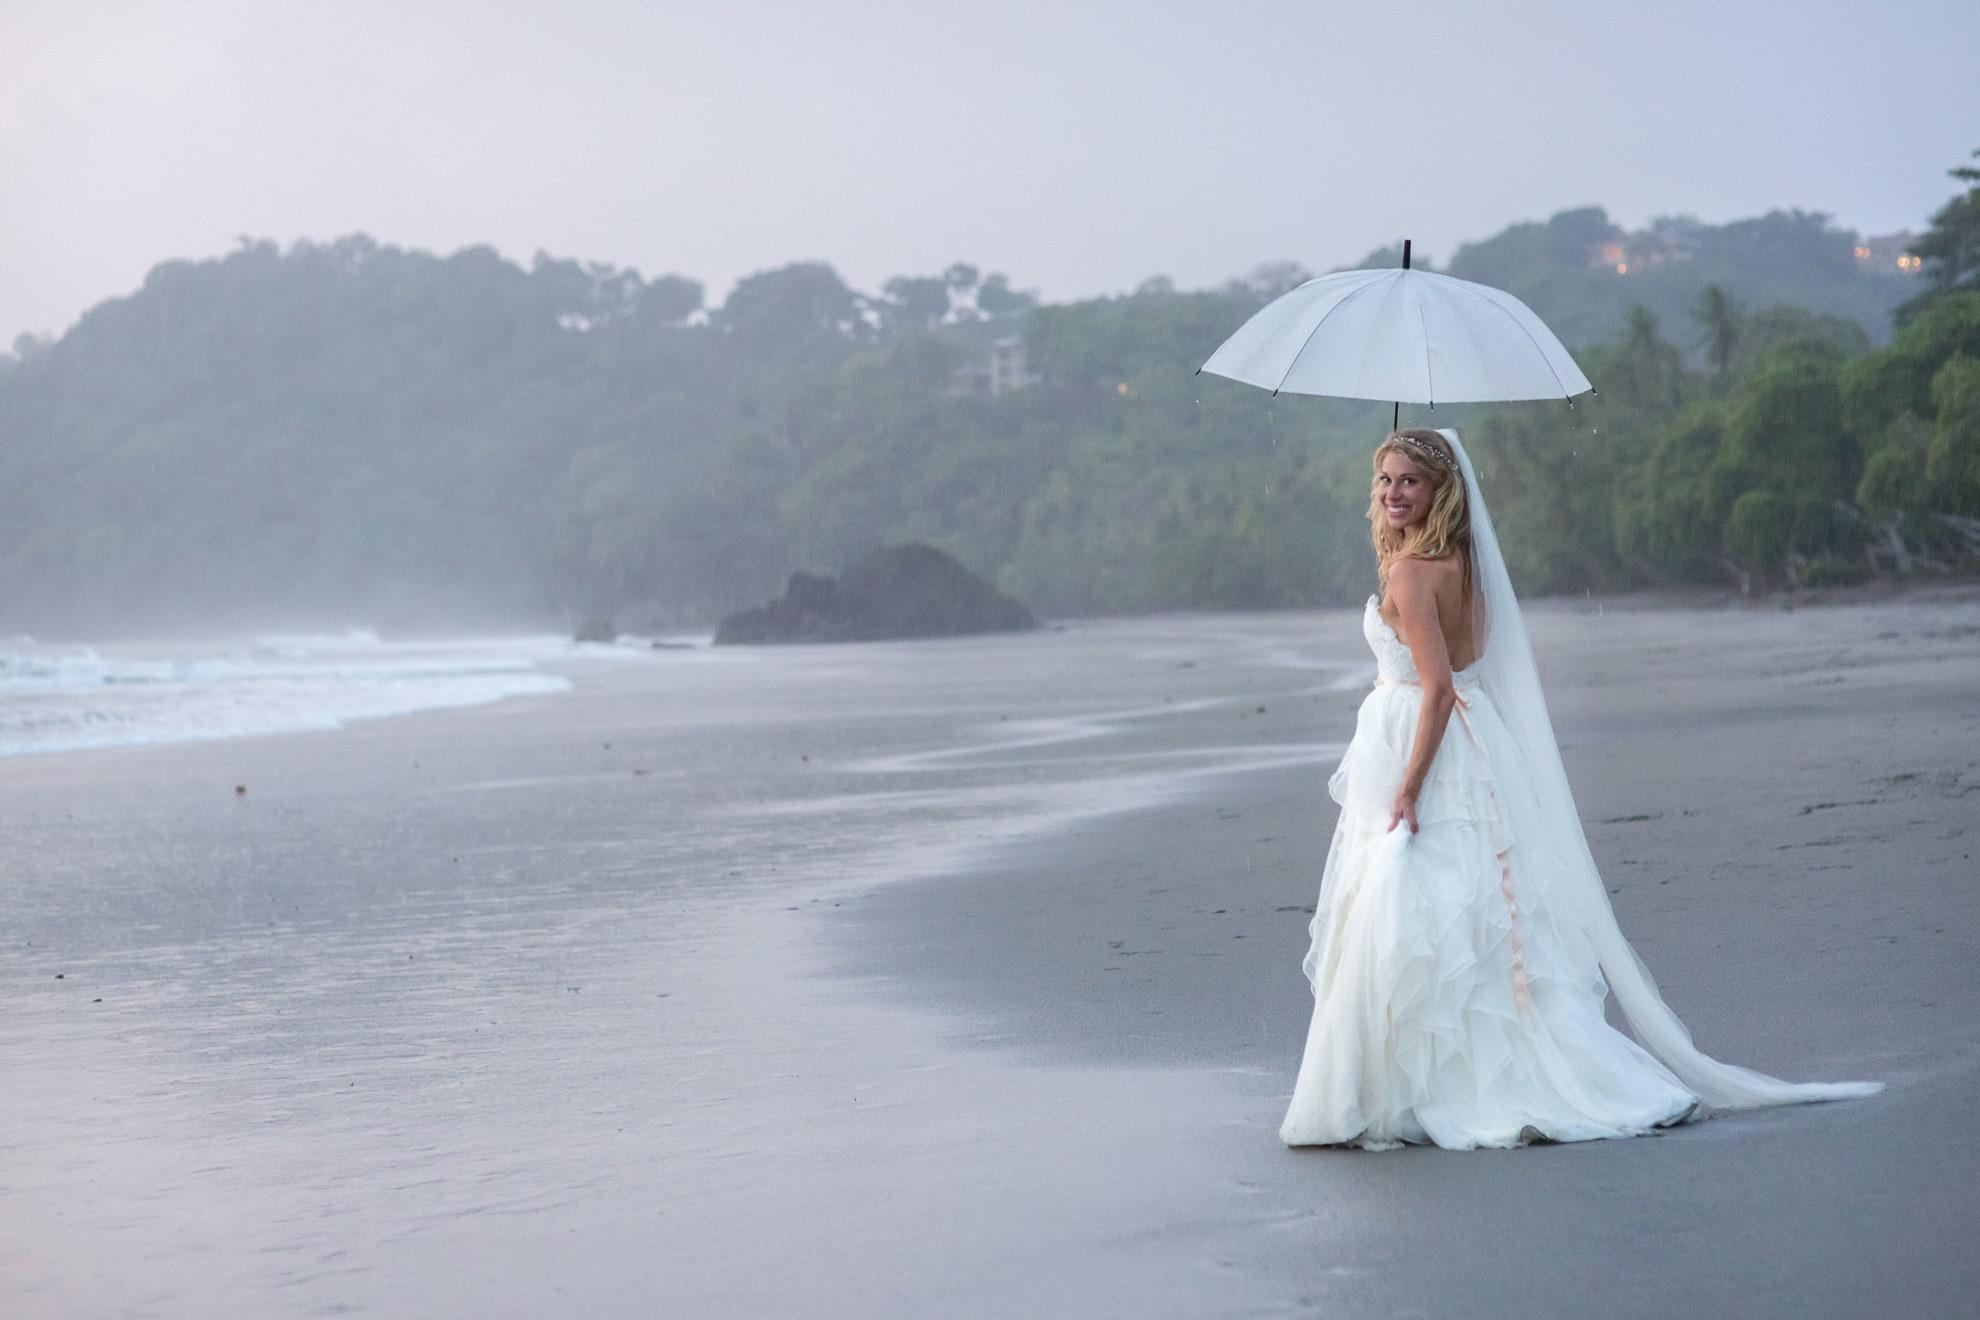 Rain at wedding